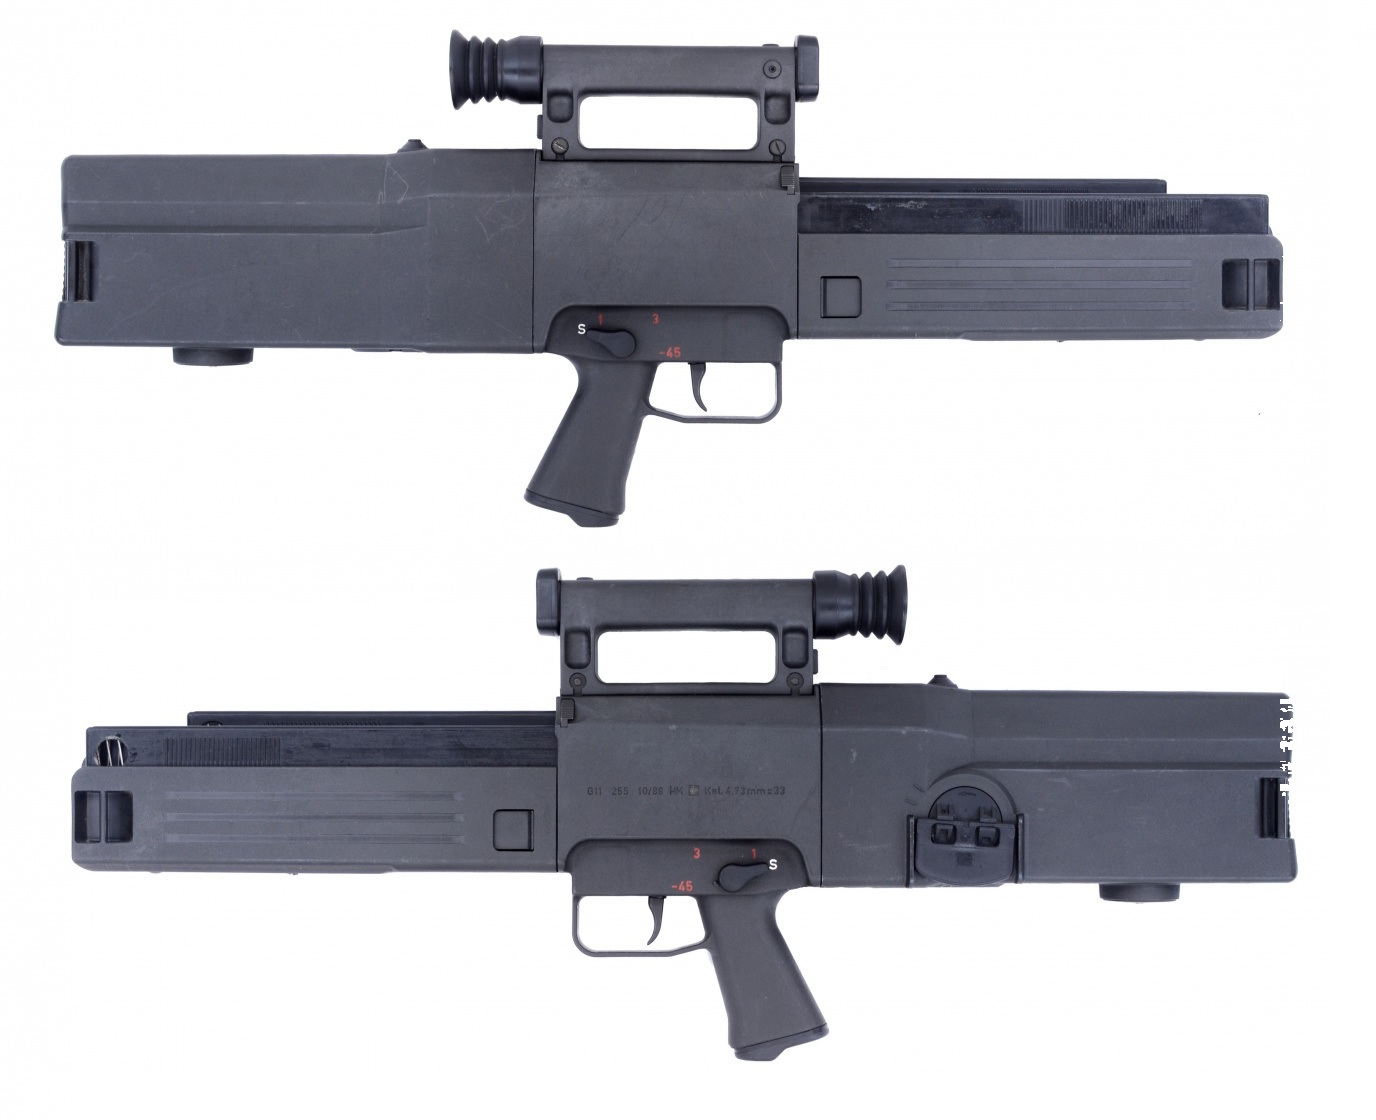 heckler koch g11 gun wiki fandom powered by wikia rh guns wikia com Moe K2 Grip AR-15 M4 Gry Daewoo K1 Rifle